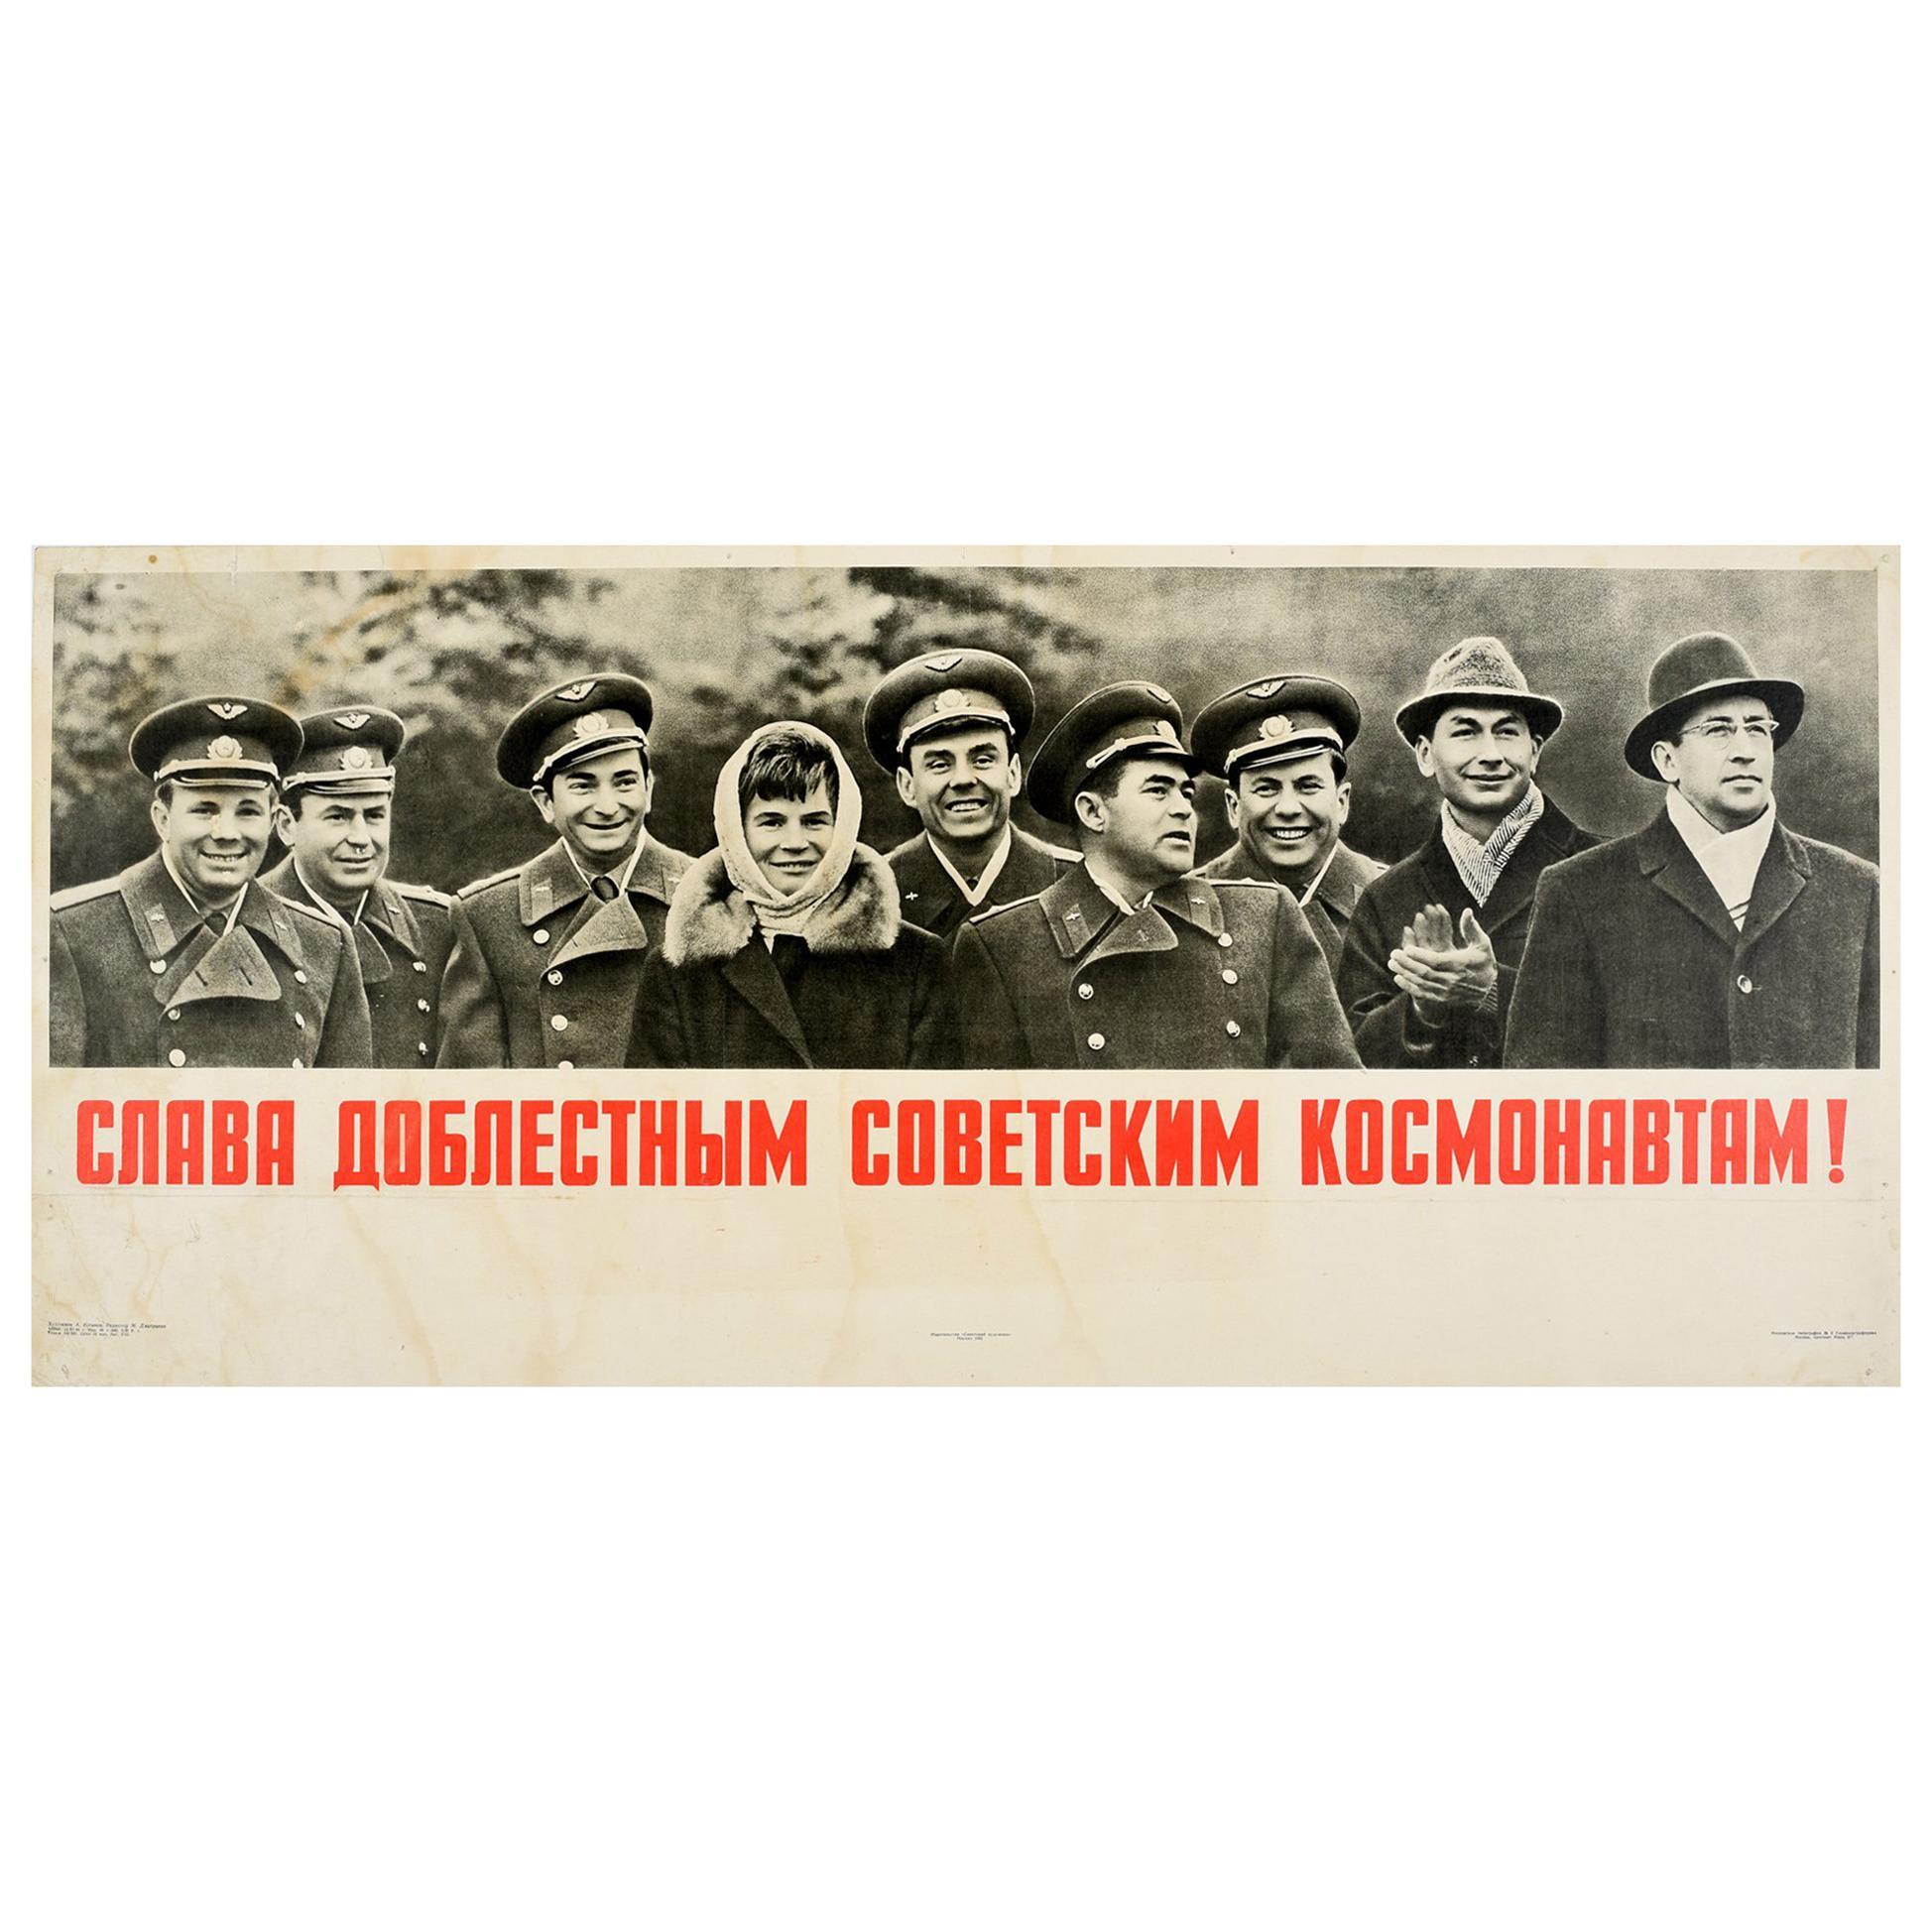 Original Vintage USSR Space Propaganda Poster Glory to Soviet Cosmonauts - Photo